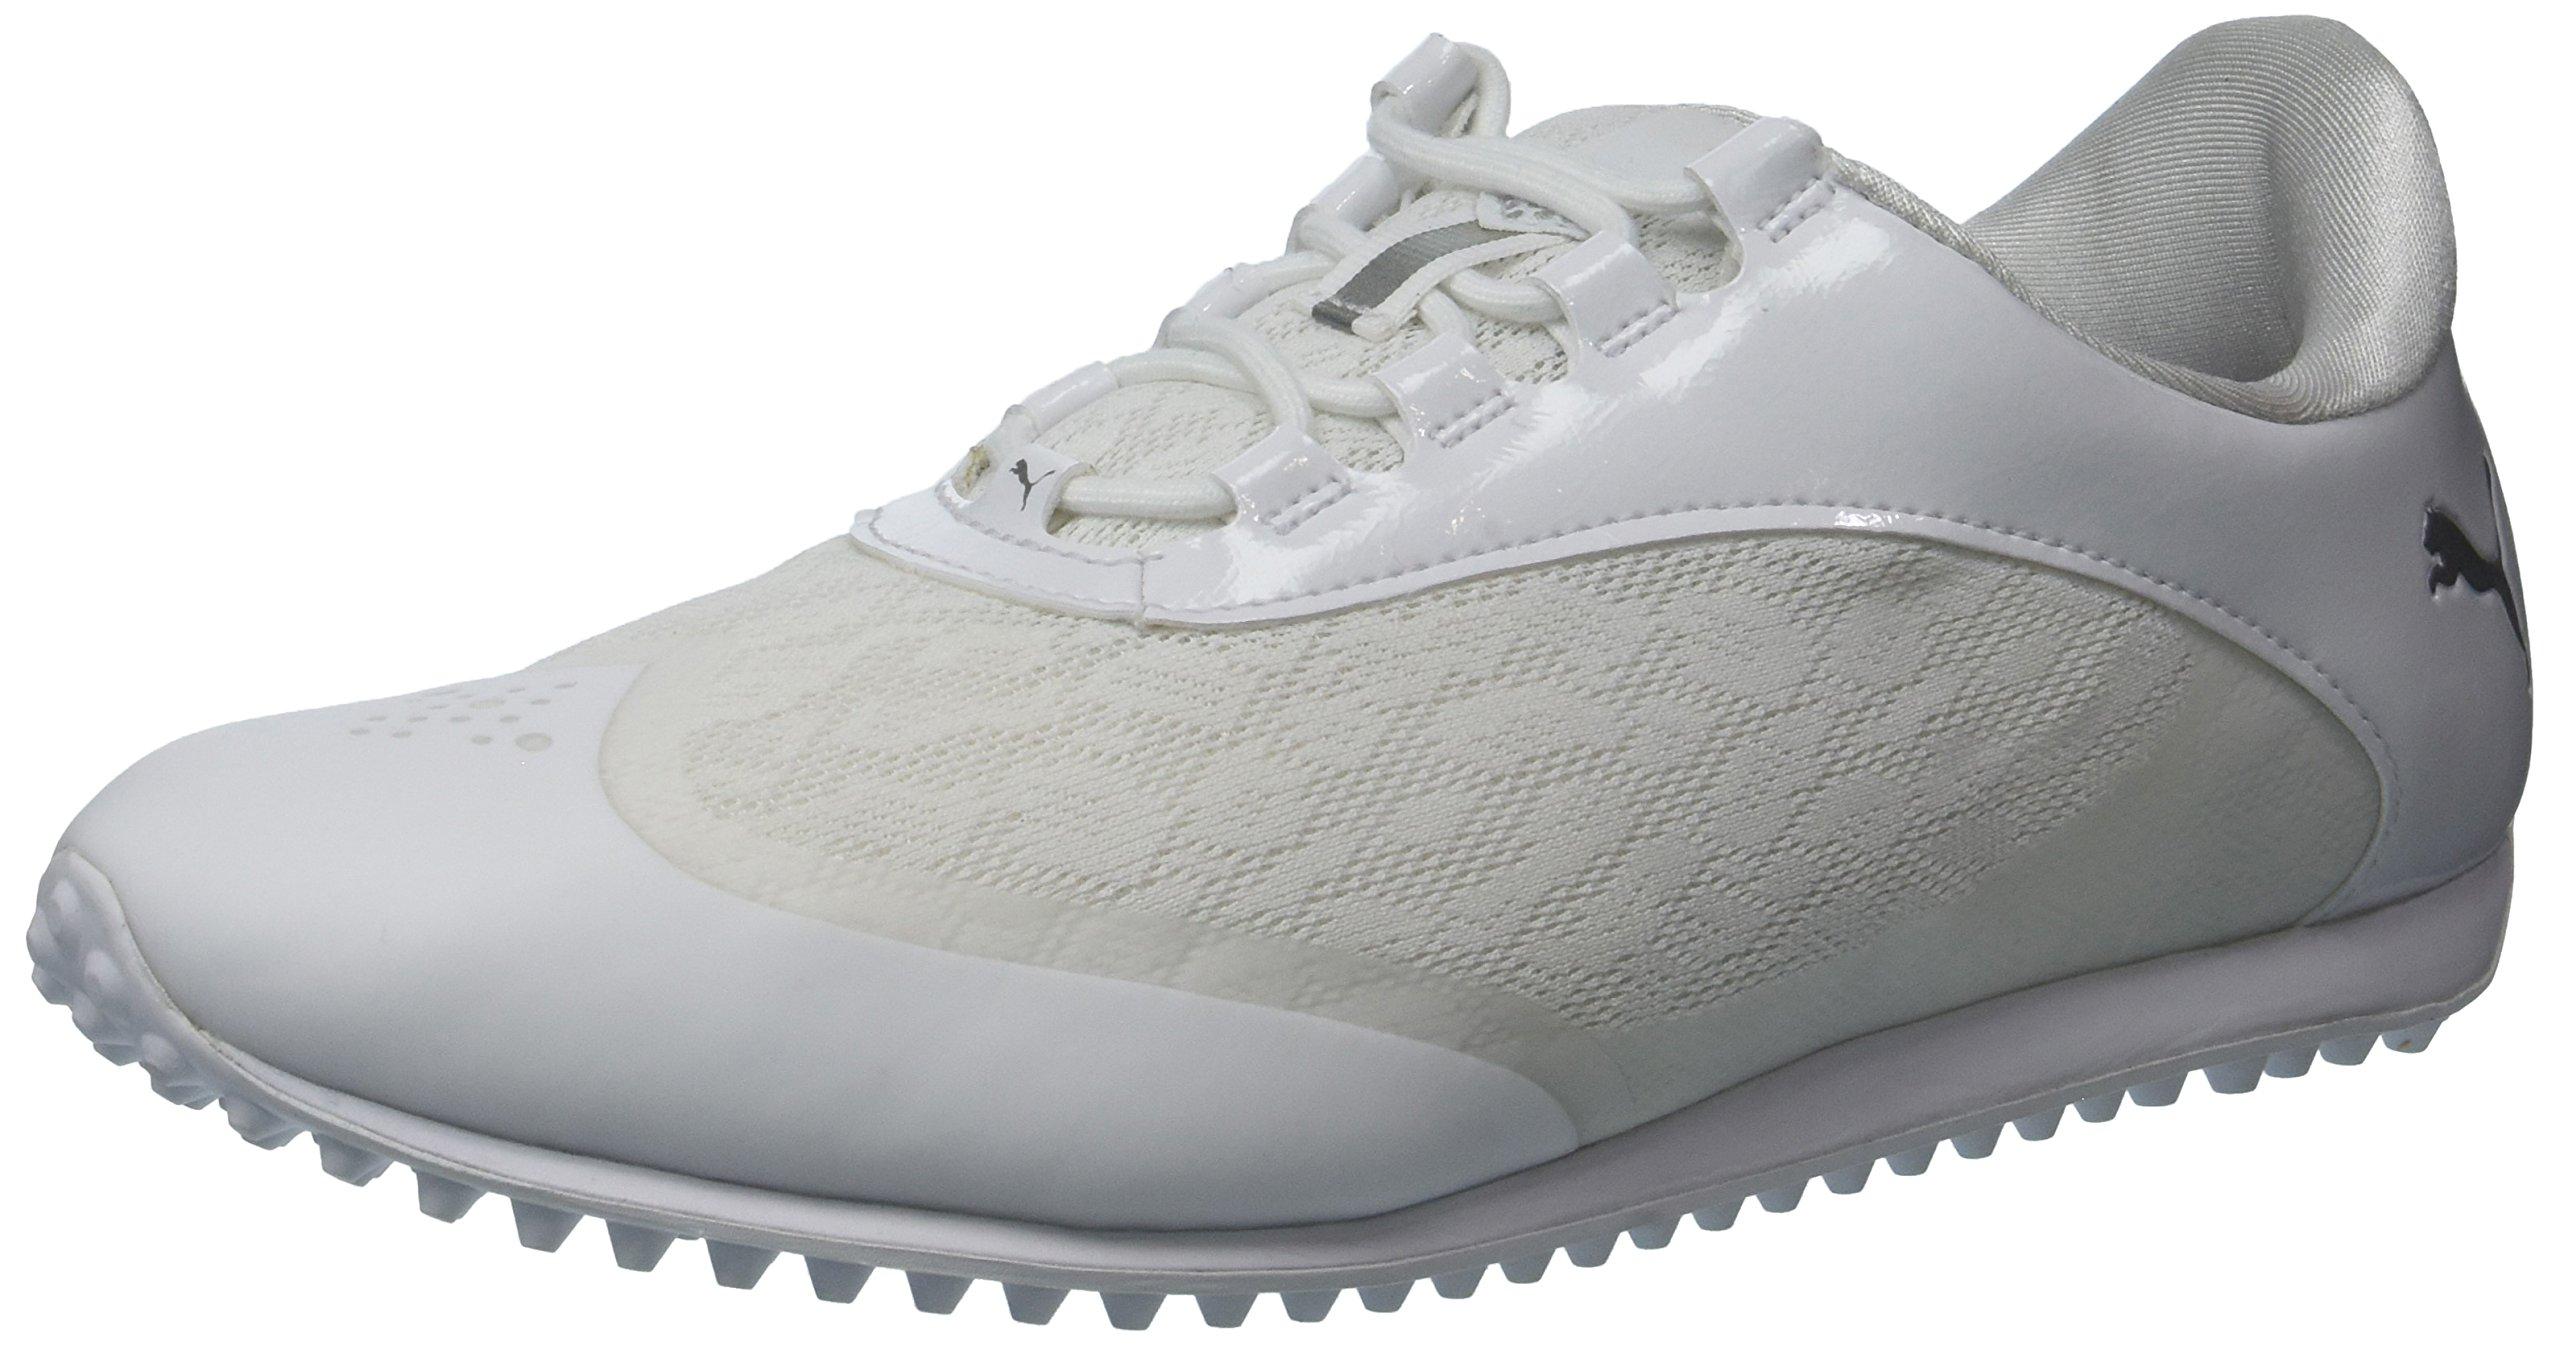 PUMA Golf Women's Summercat Sport Golf Shoe, White/Silver/High Rise, 7 Medium US